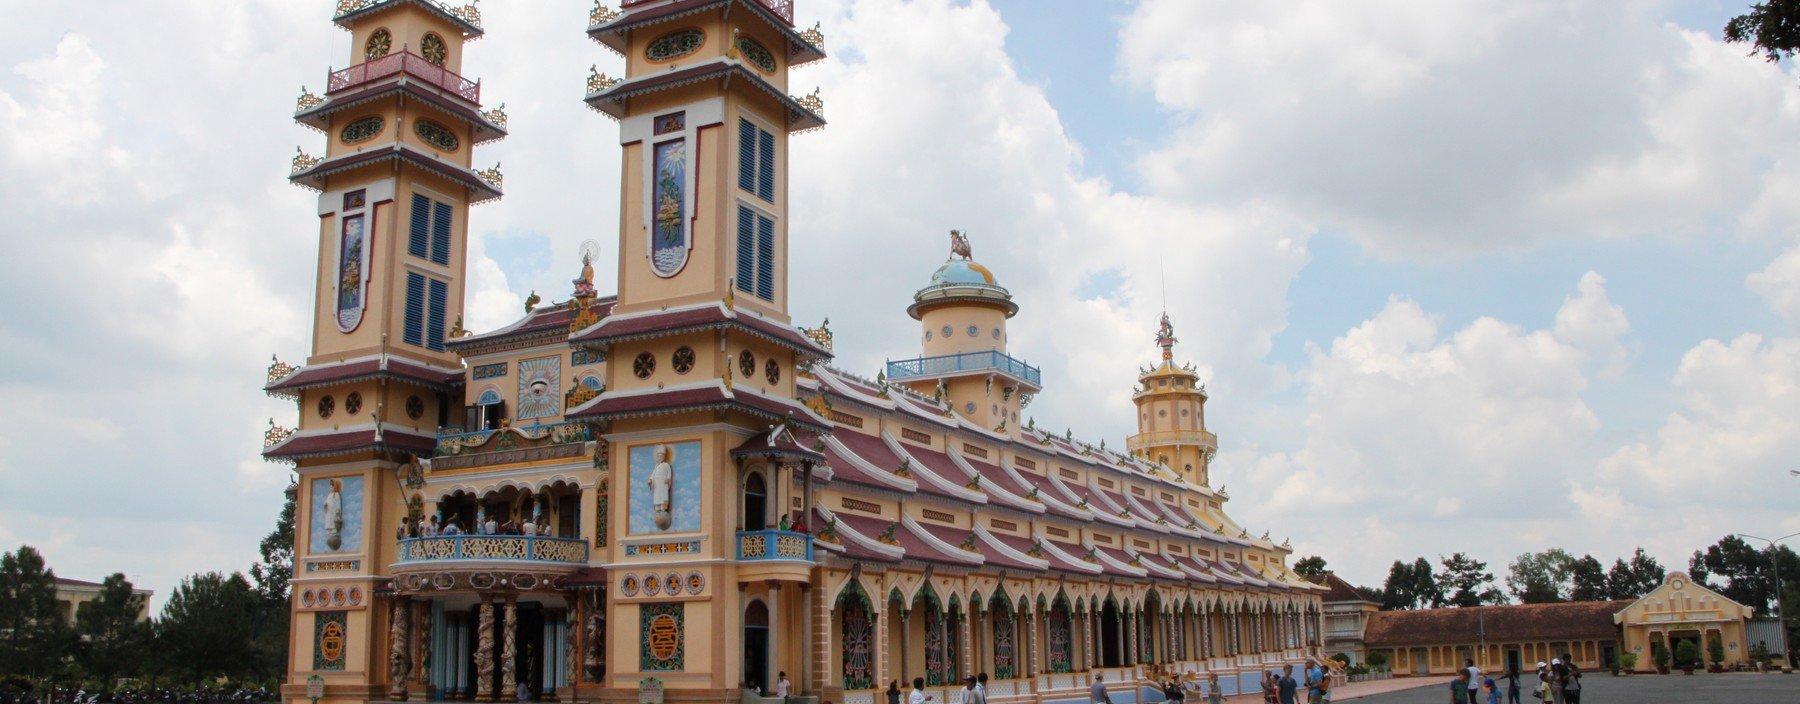 vn, ho chi minh city, cao dai great tempel (18).jpg